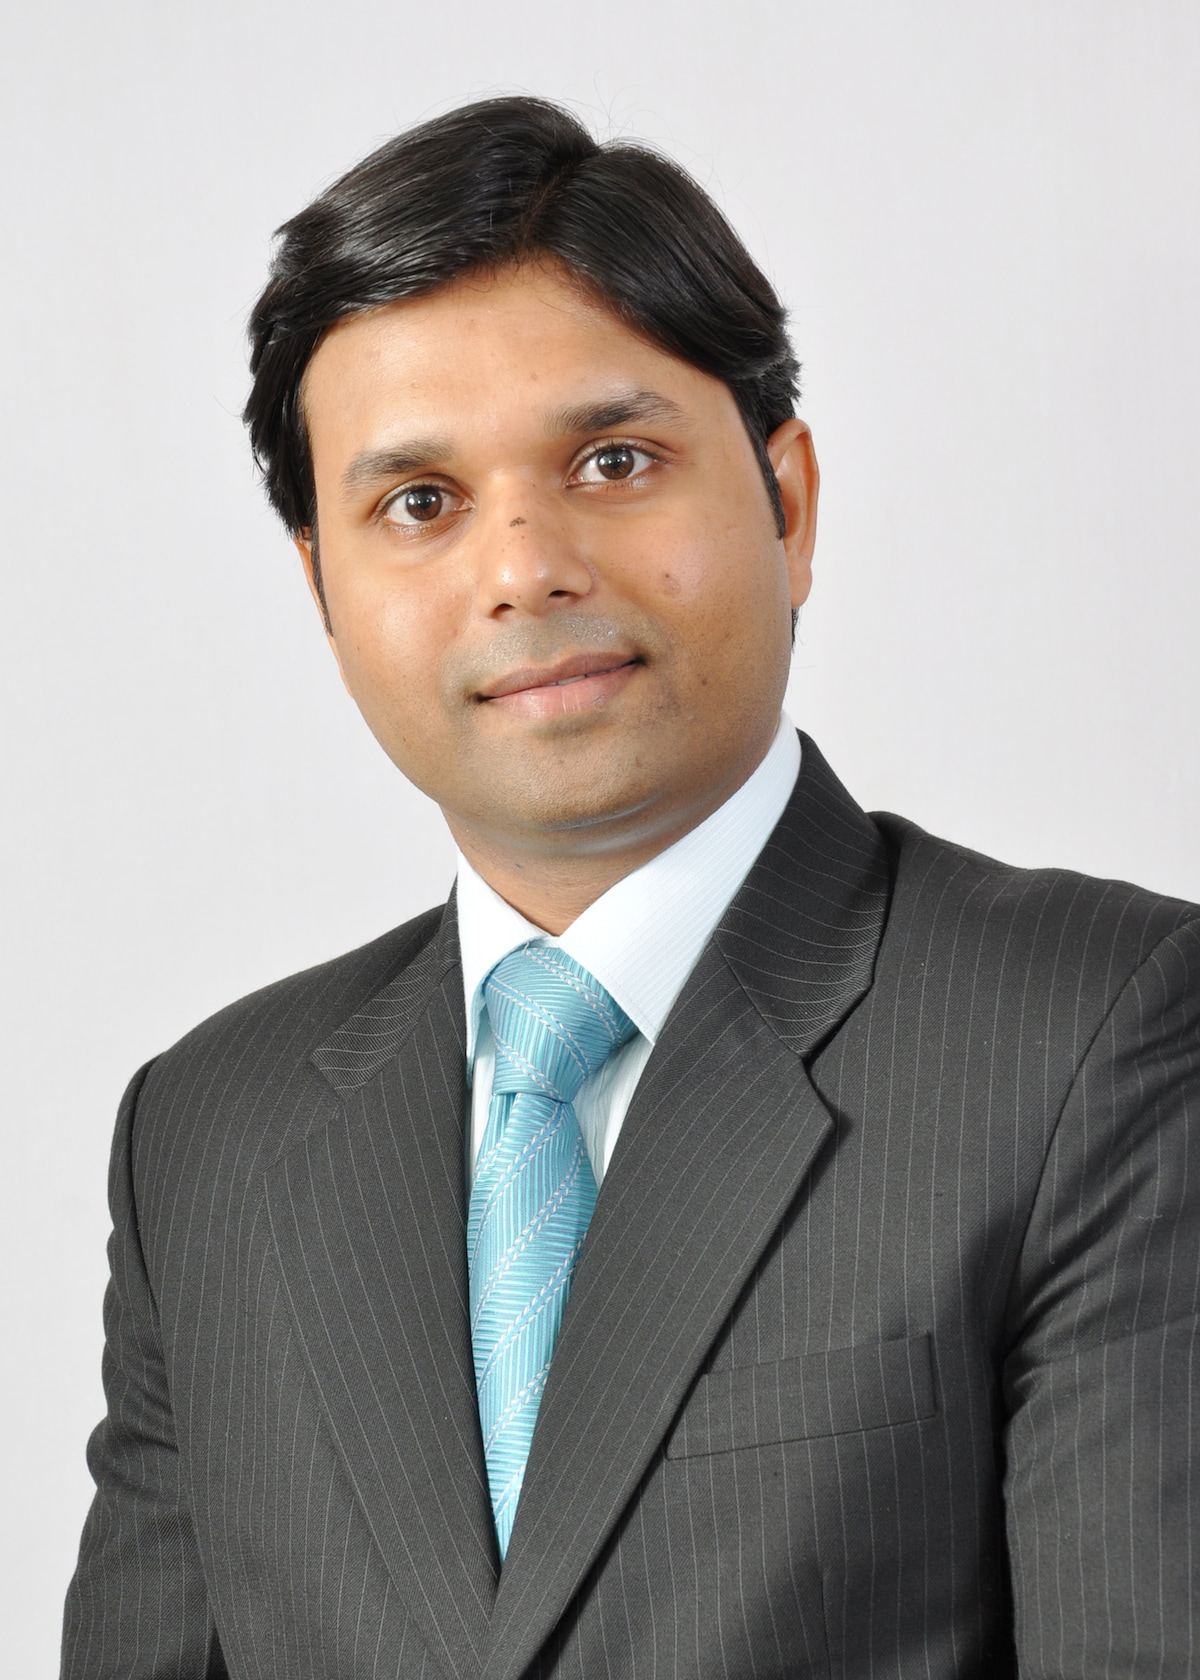 Rahul from New Delhi